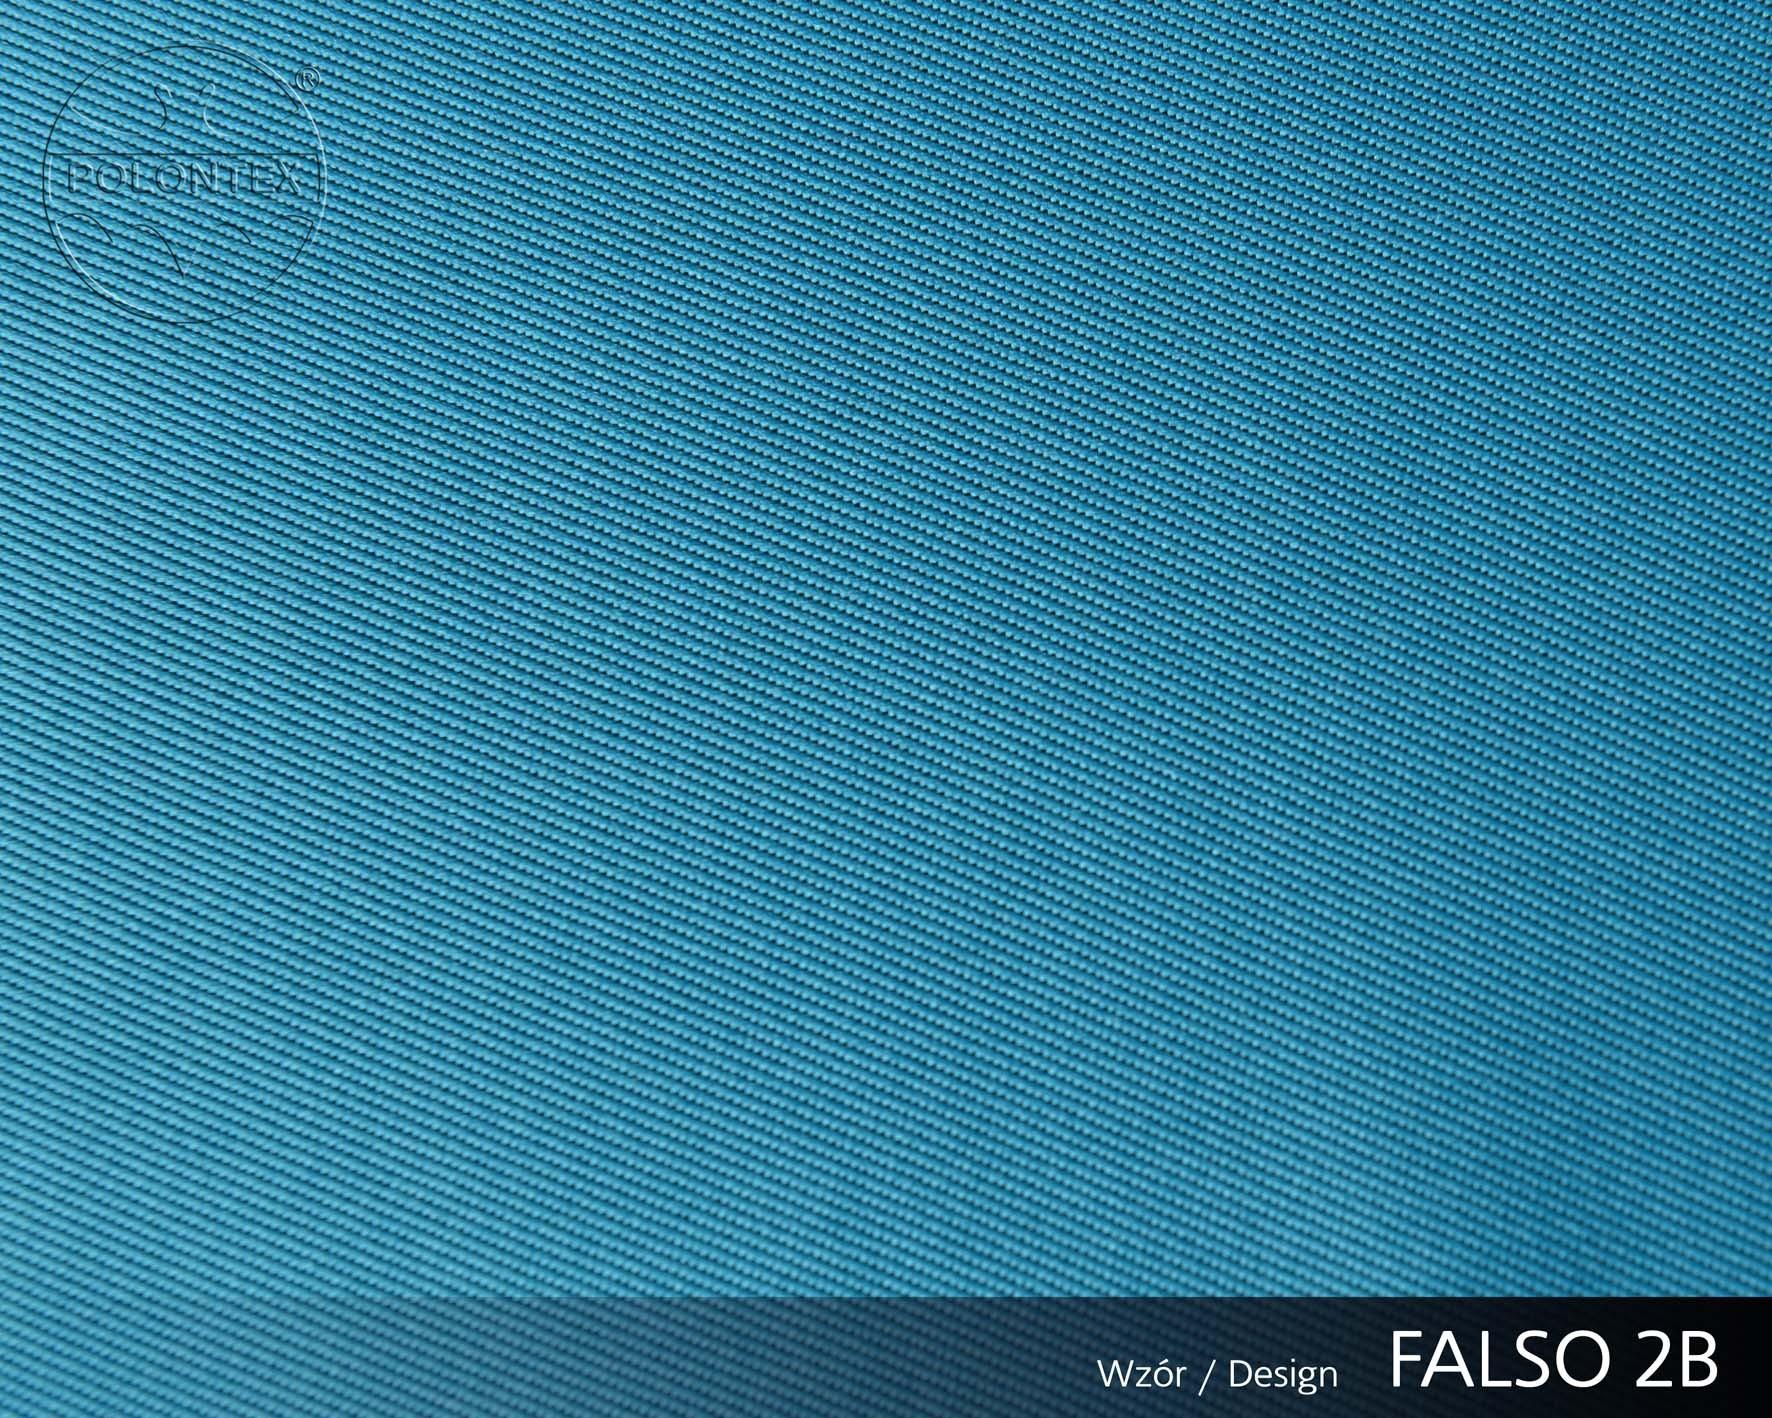 Falso B209